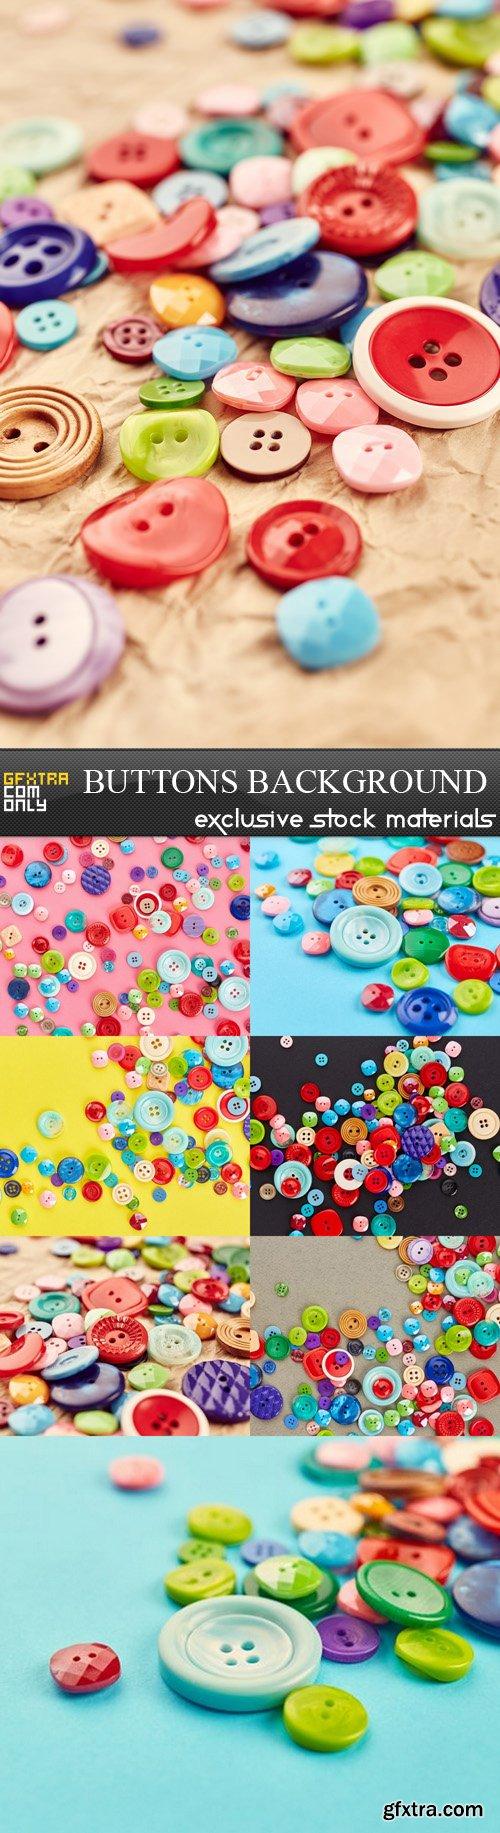 Buttons Background - 8 UHQ JPEG